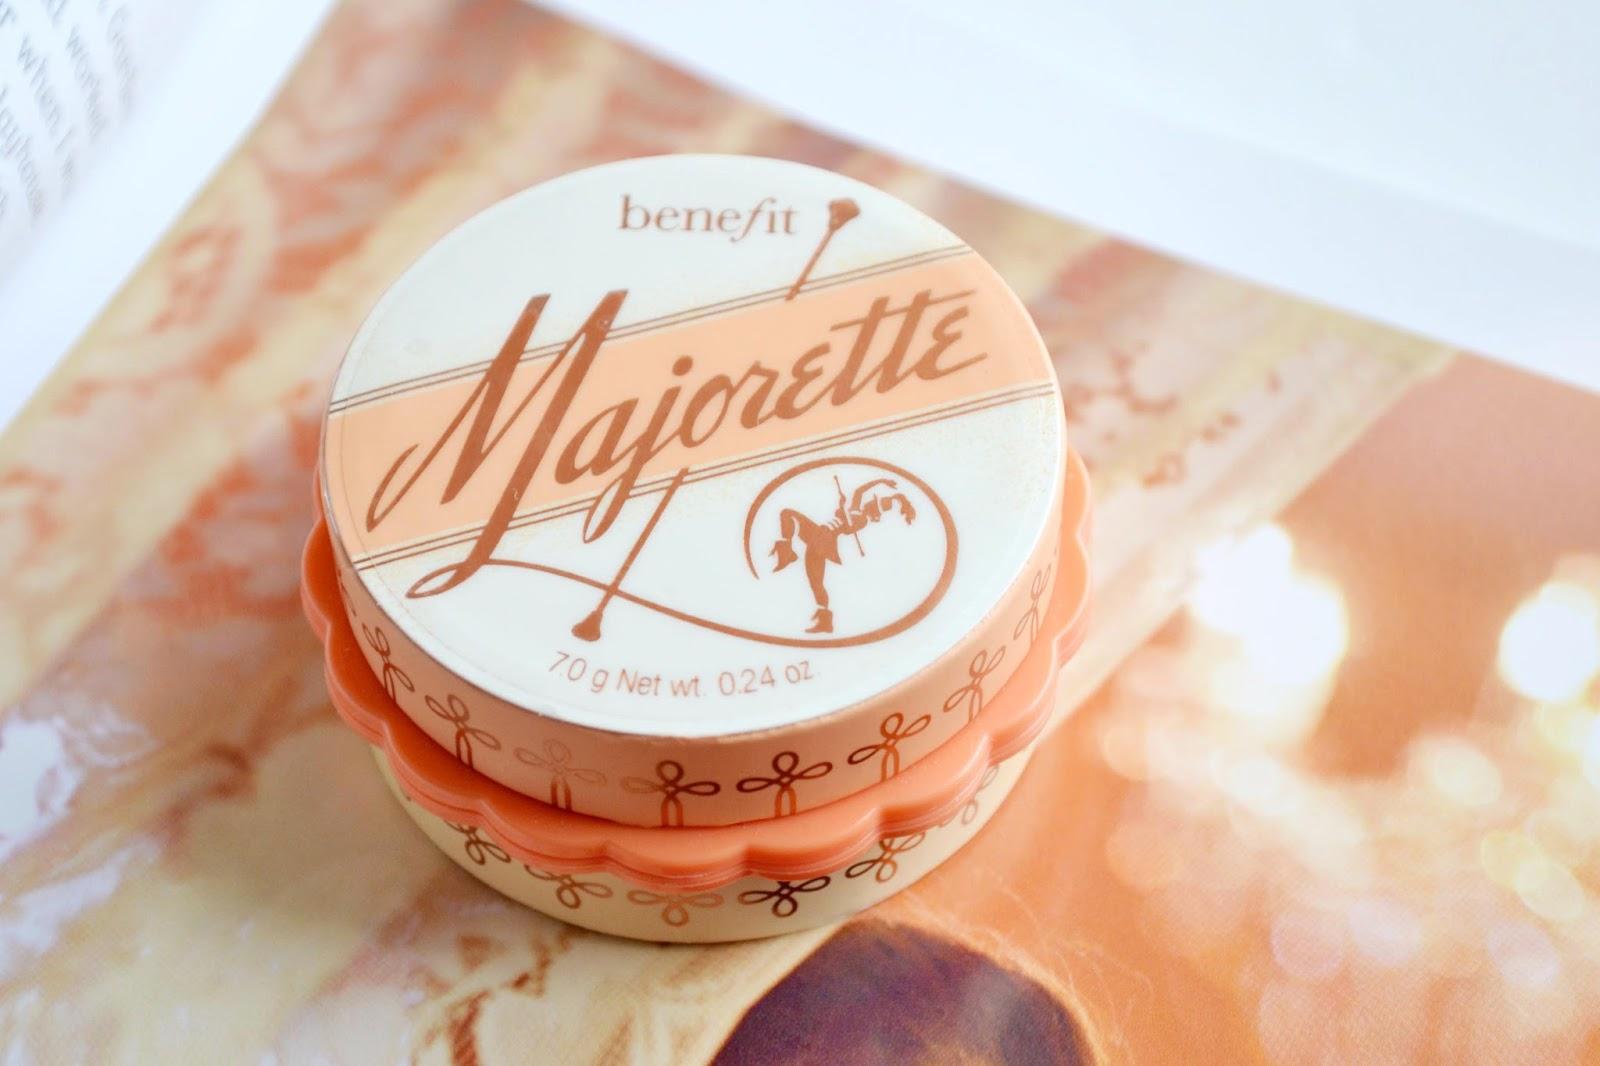 benefit Majorette, Majorette cream blush, majorette blusher